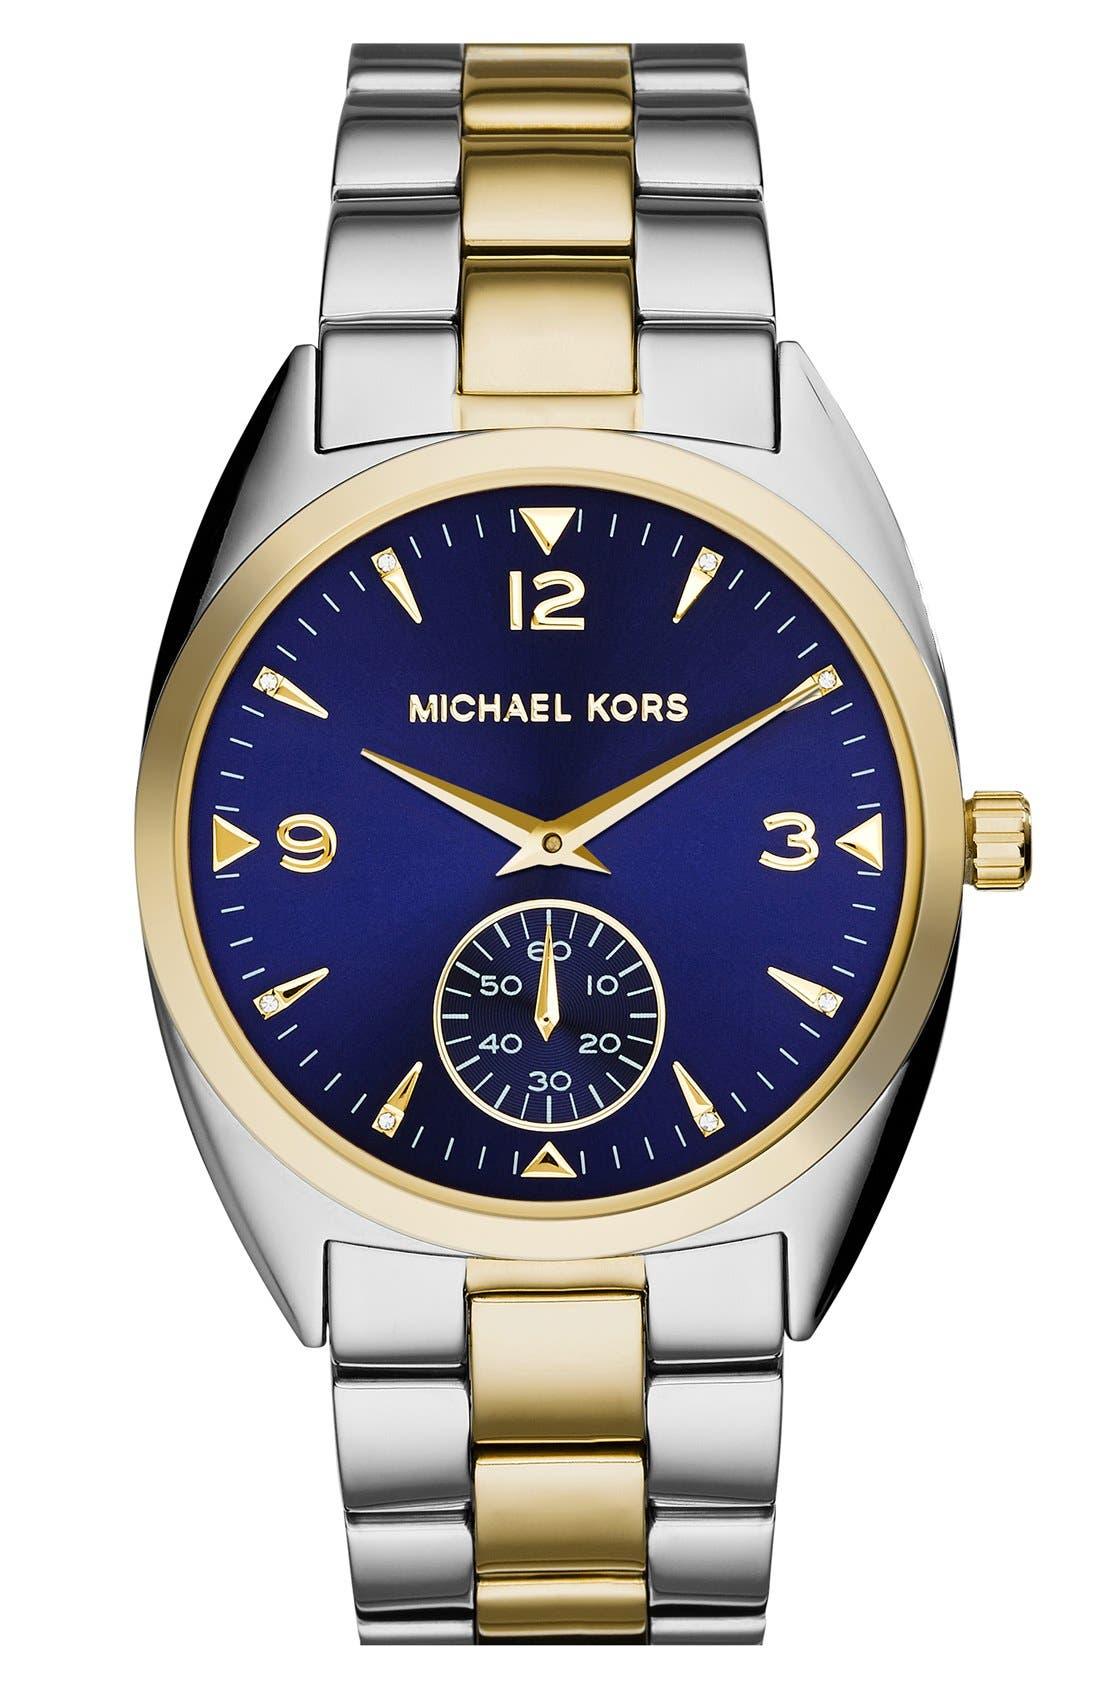 Main Image - Michael Kors 'Callie' Multifunction Bracelet Watch, 39mm